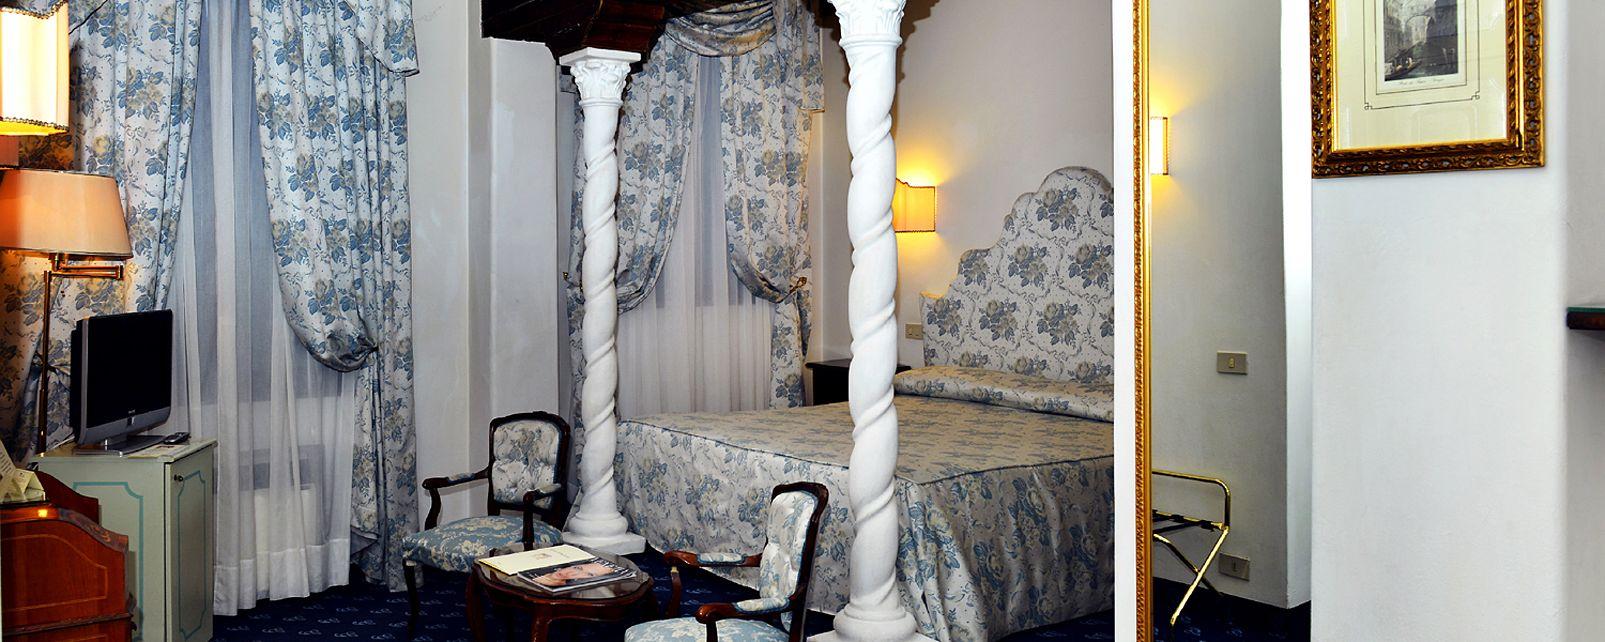 Hôtel Giorgione